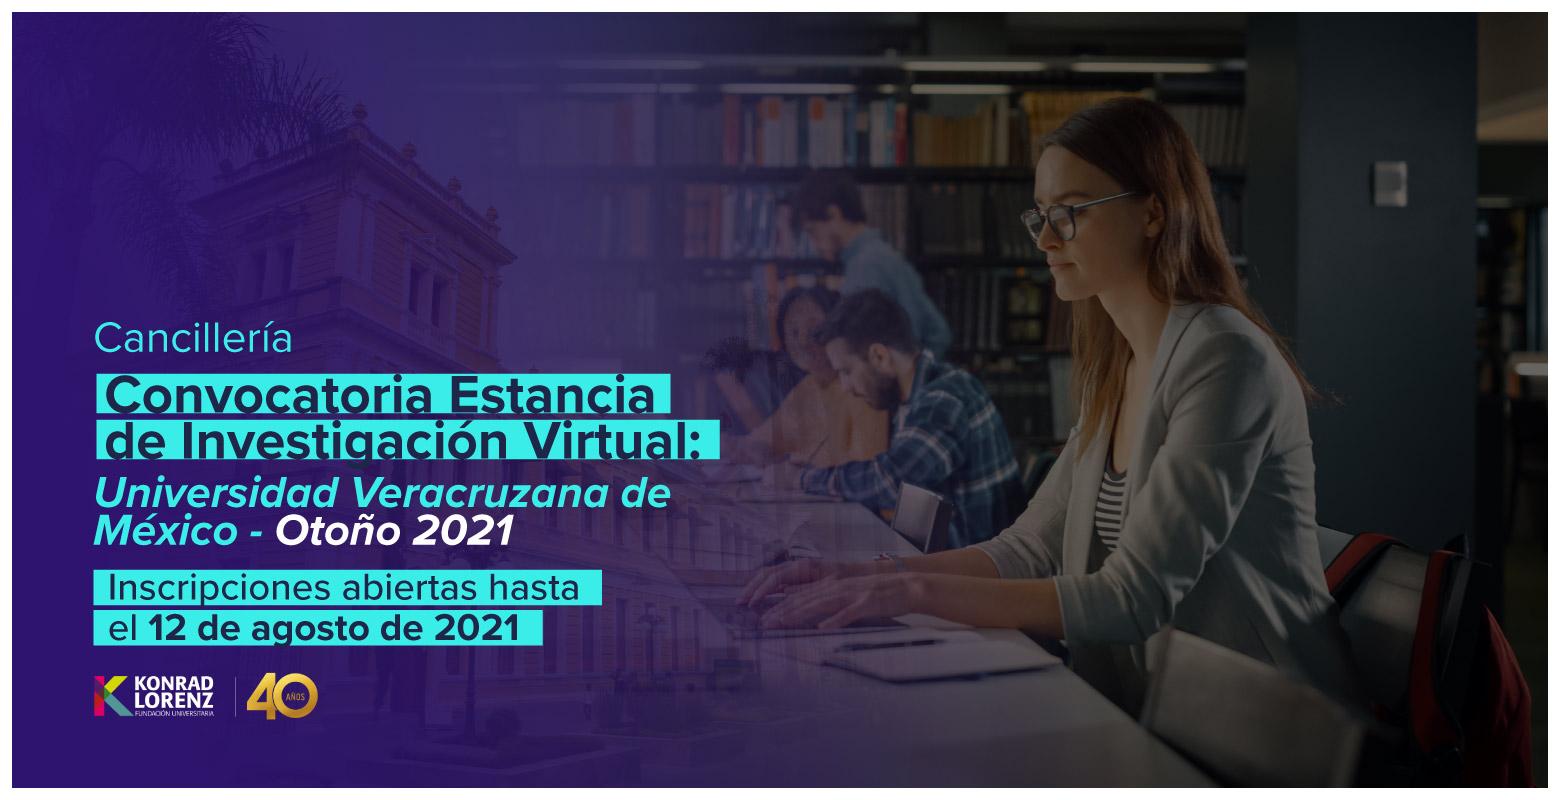 Convocatoria Estancia de Investigación Virtual: Universidad Veracruzana de México - Otoño 2021